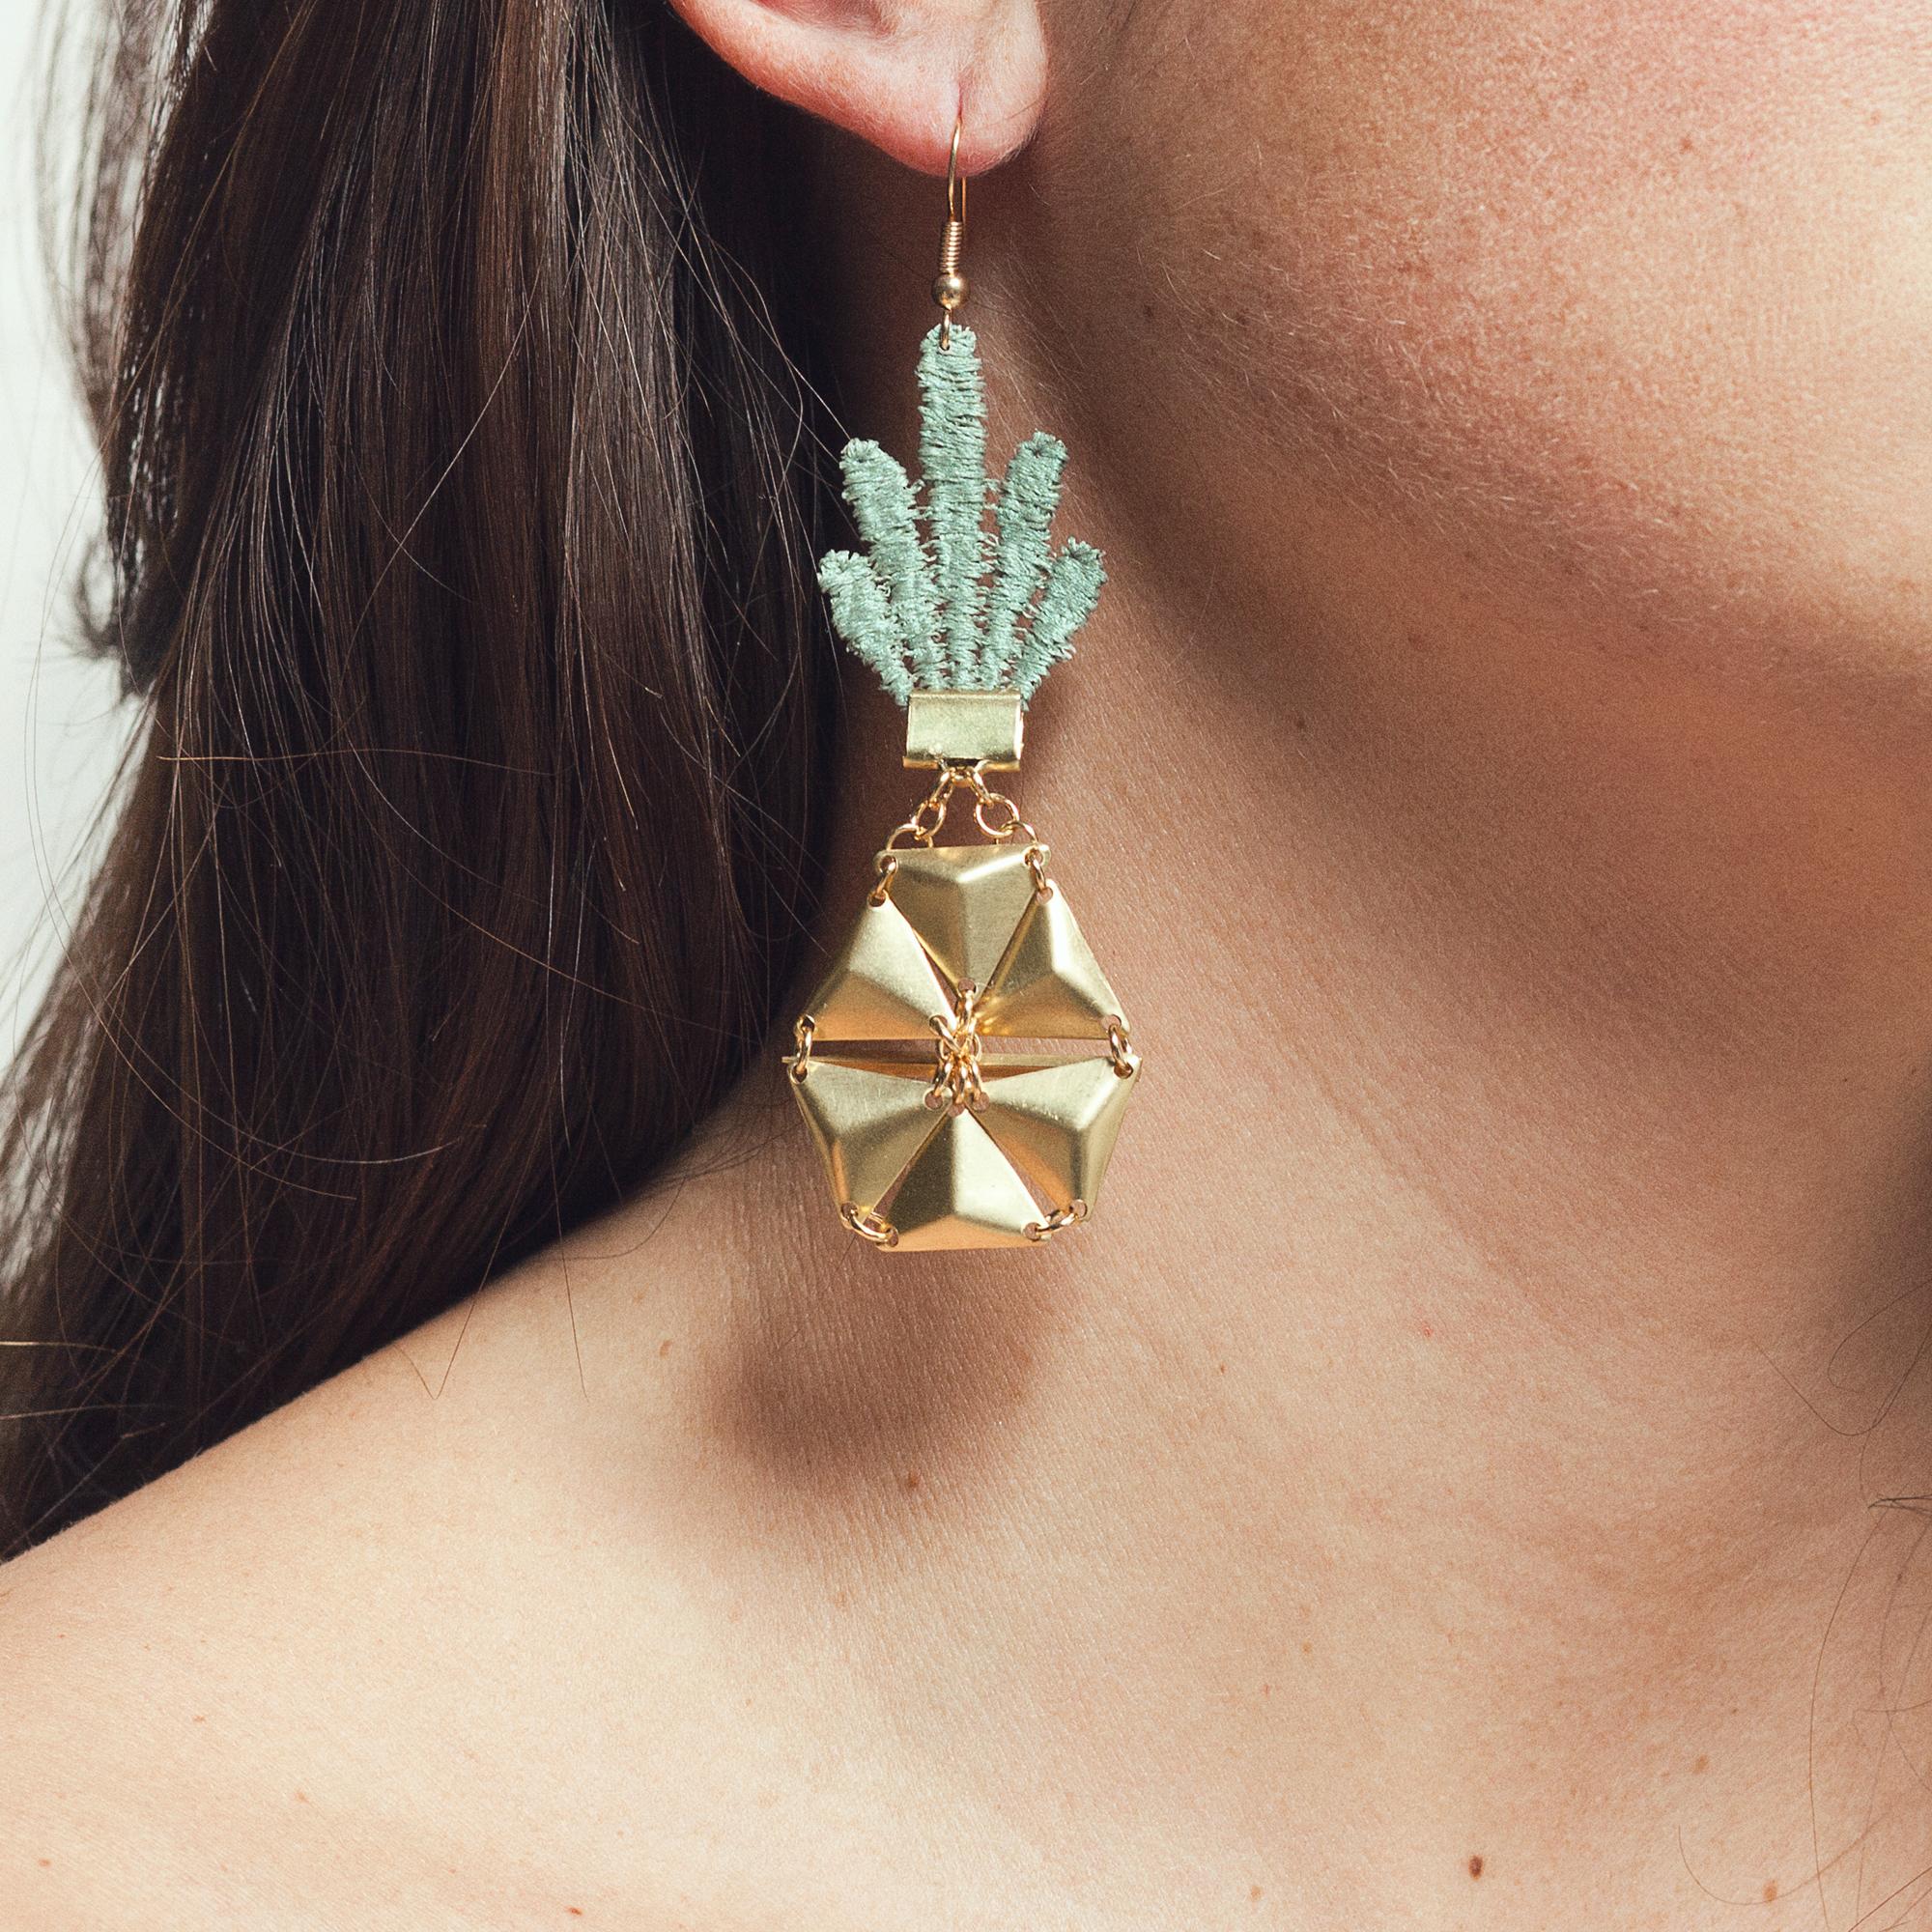 Pineapple earrings (details here)